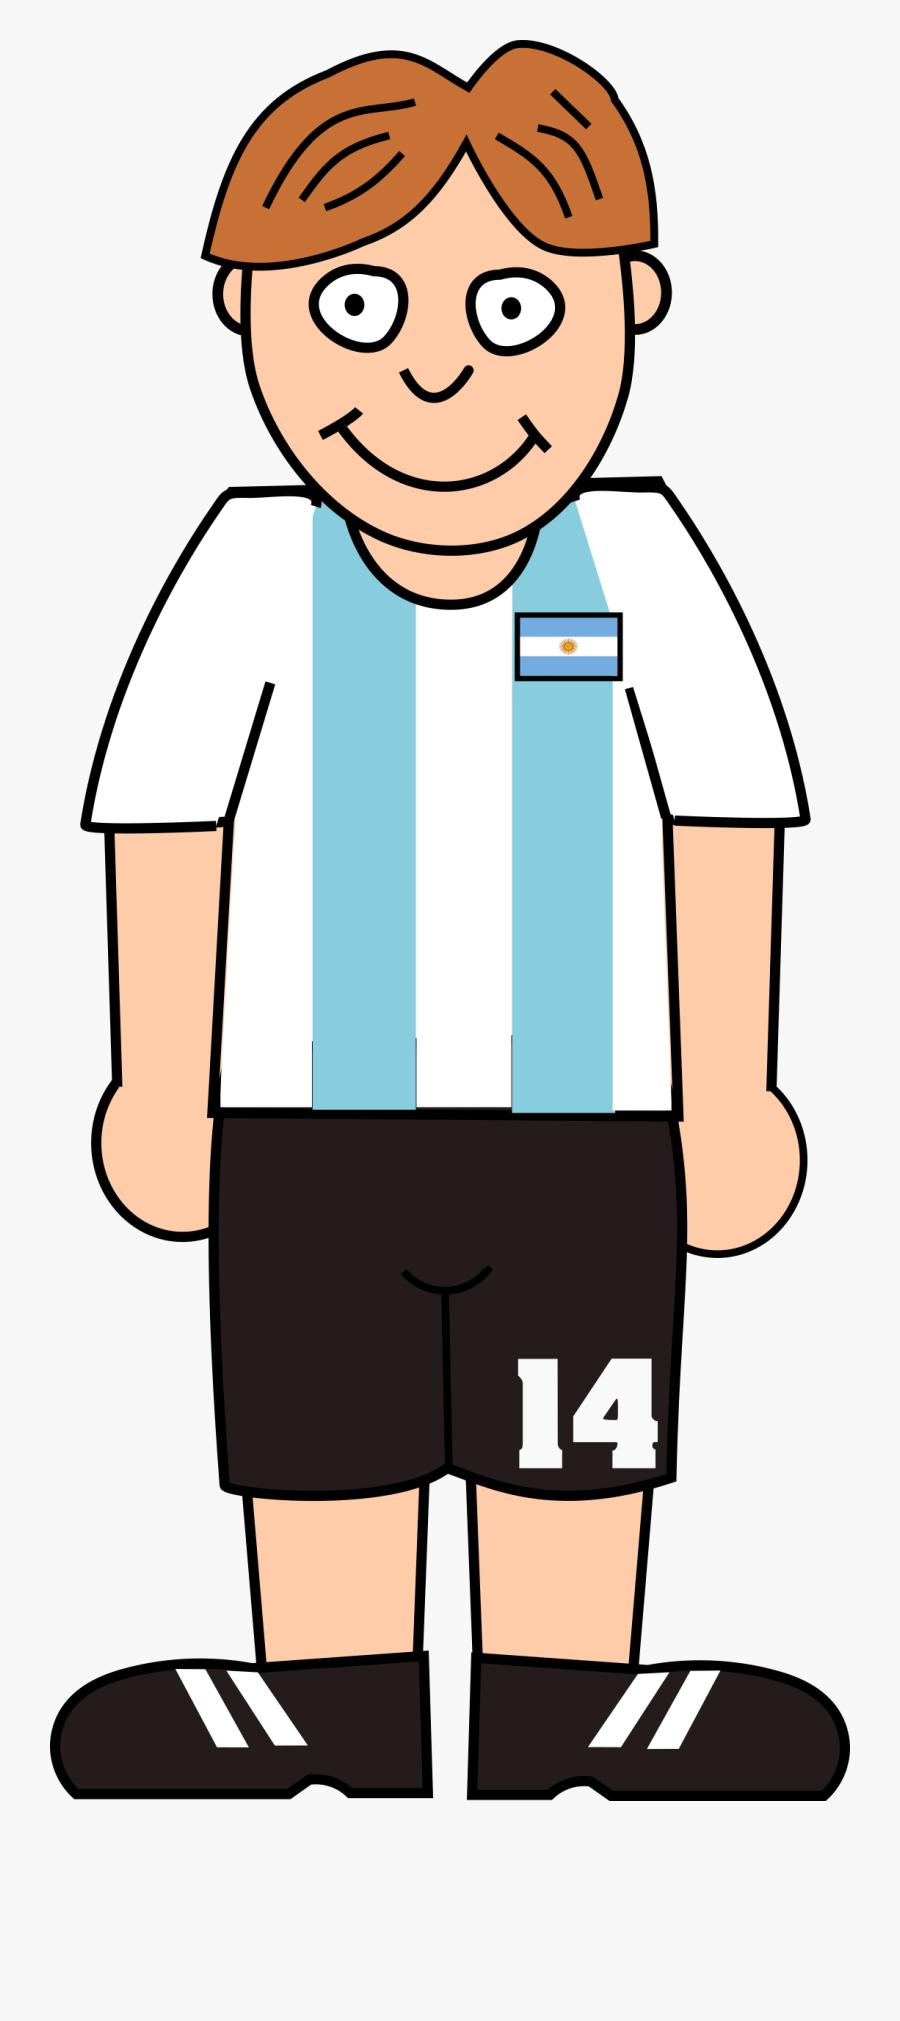 Standing Soccer Player Clipart - Soccer Player Clip Art, Transparent Clipart